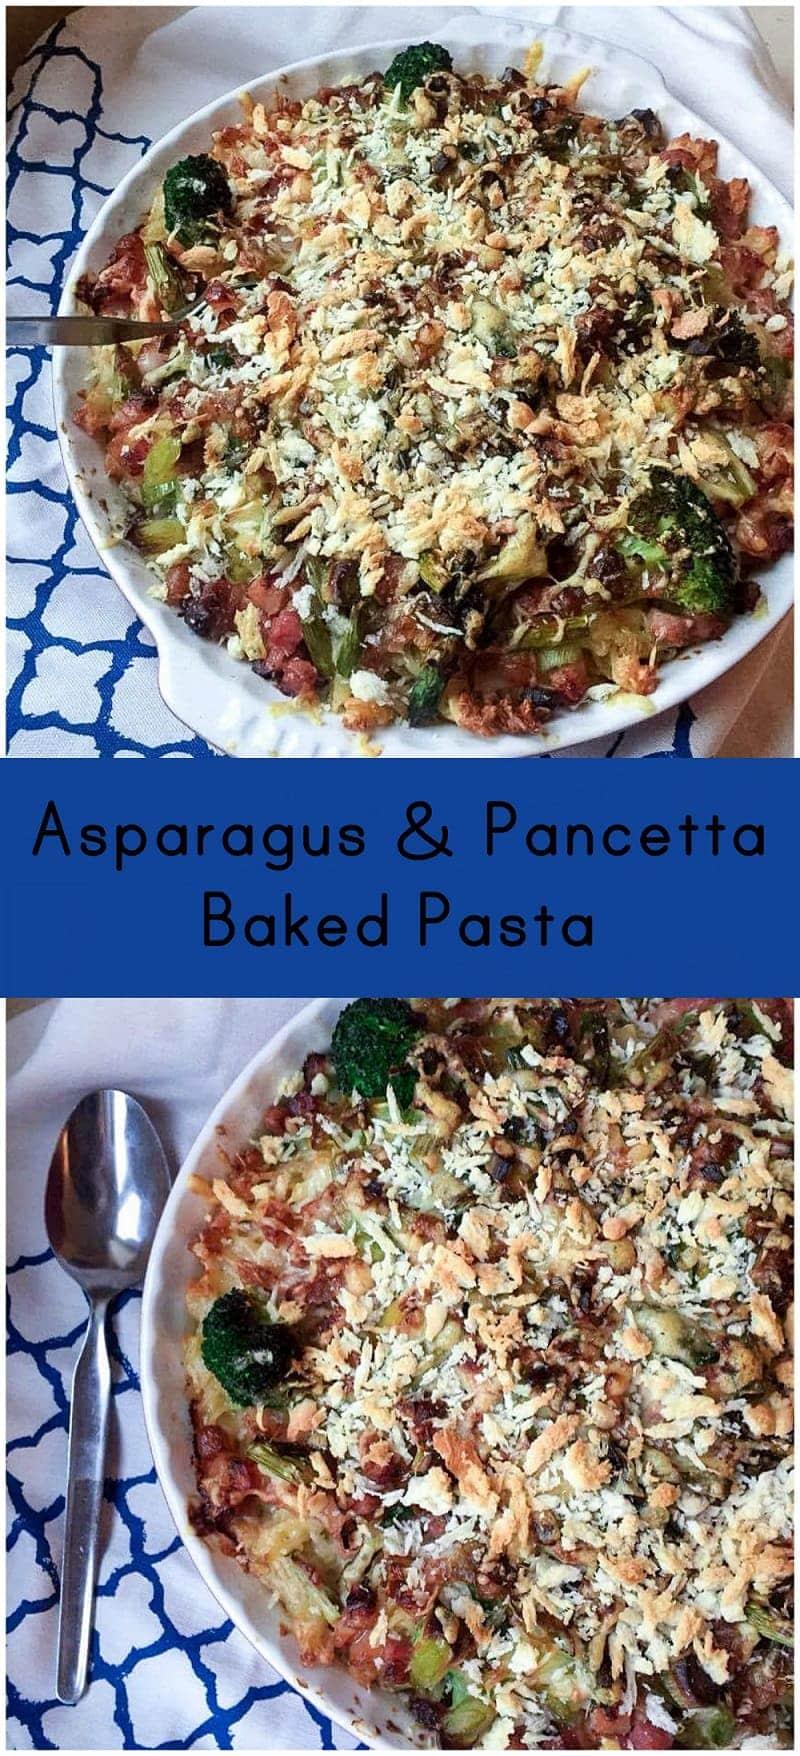 Asparagus & Pancetta Baked Pasta